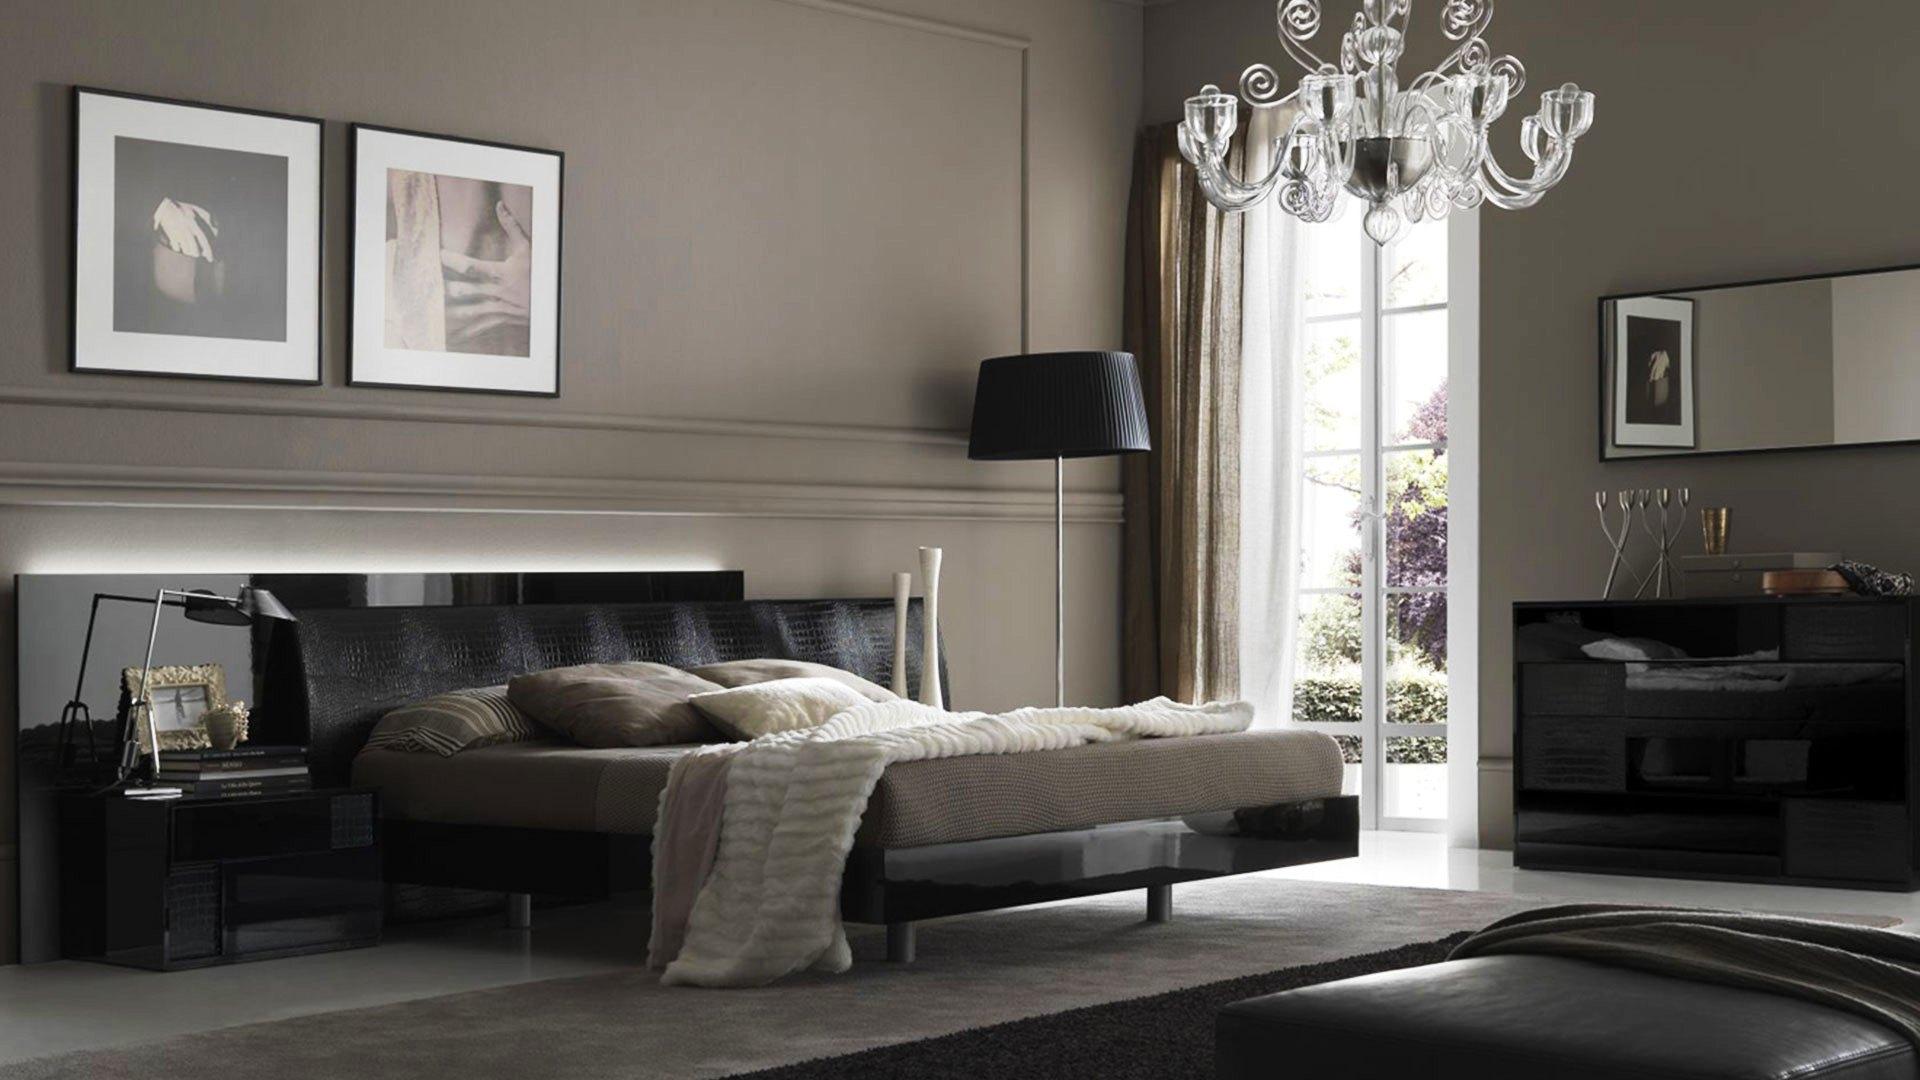 40+] Wallpaper for Men\'s Bedroom on WallpaperSafari